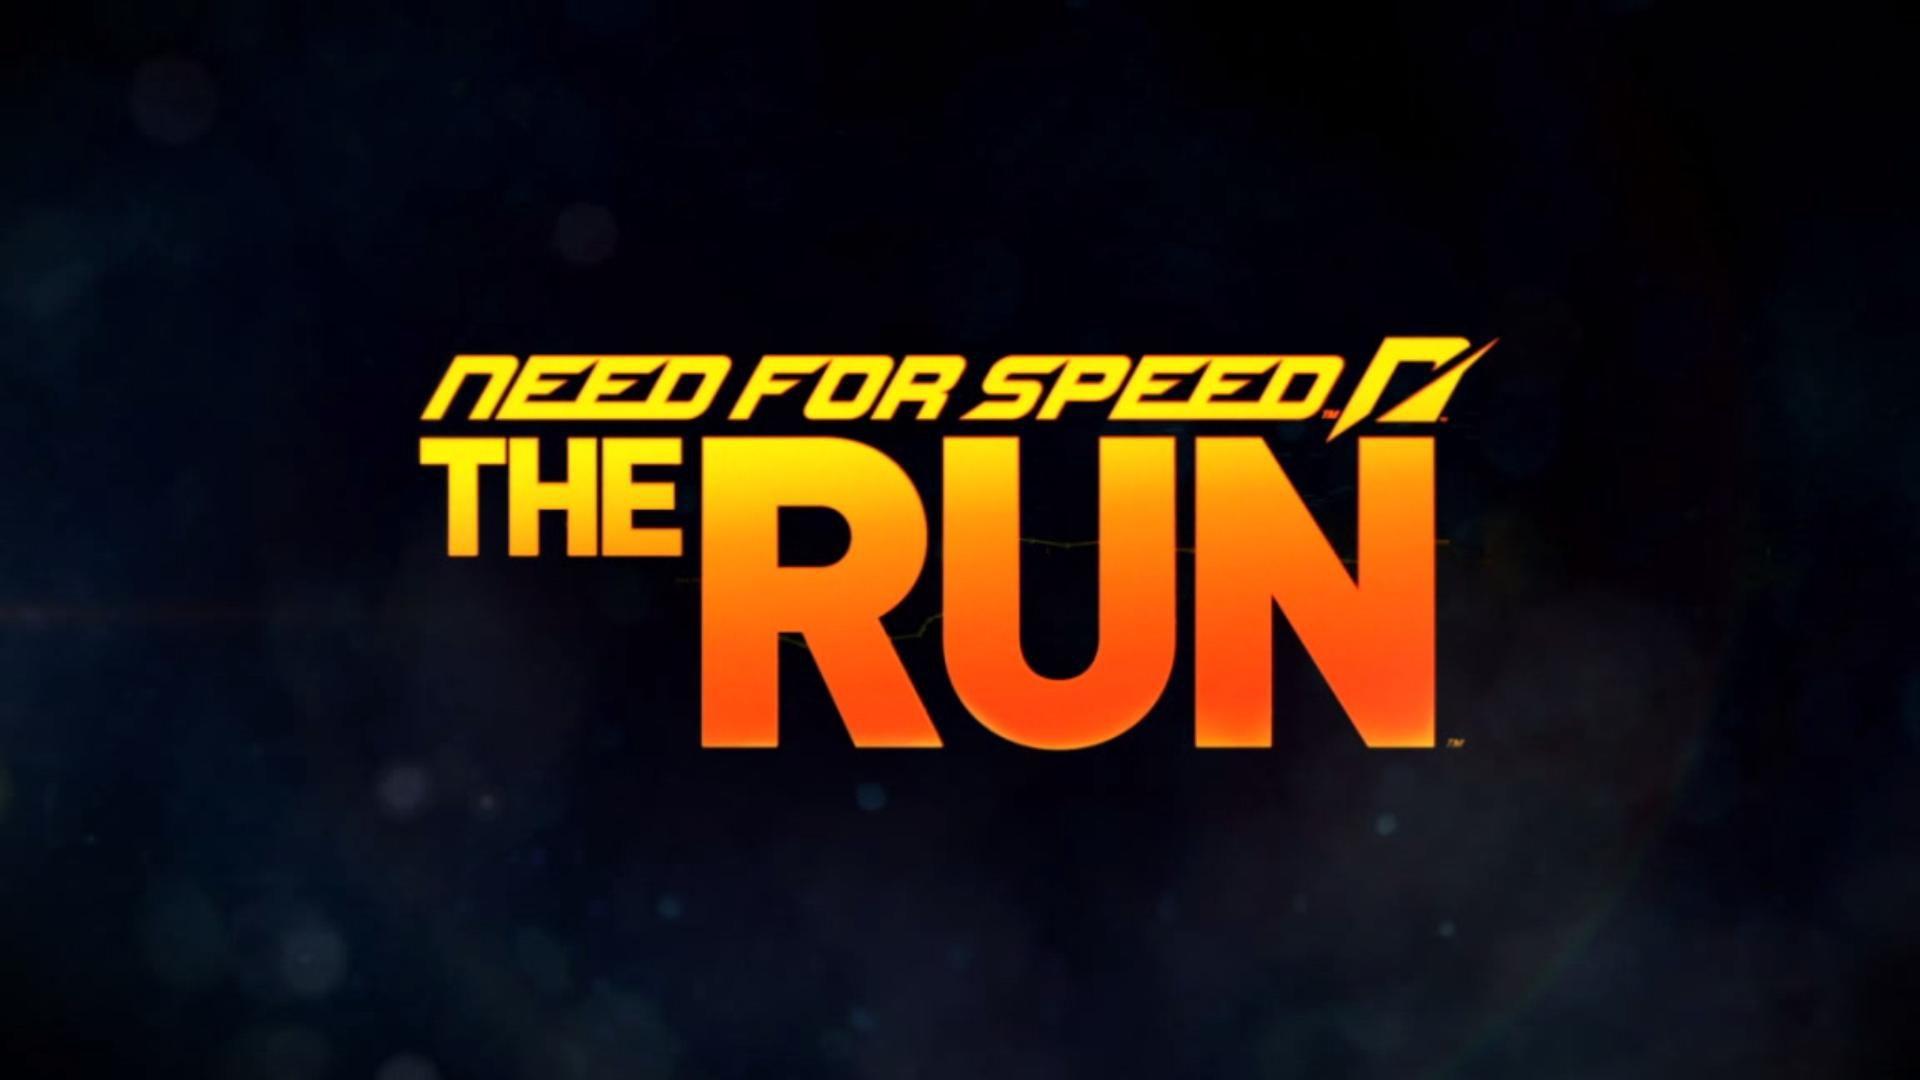 Need For Speed The Run 2011-11-15 17-20-08-58.jpg